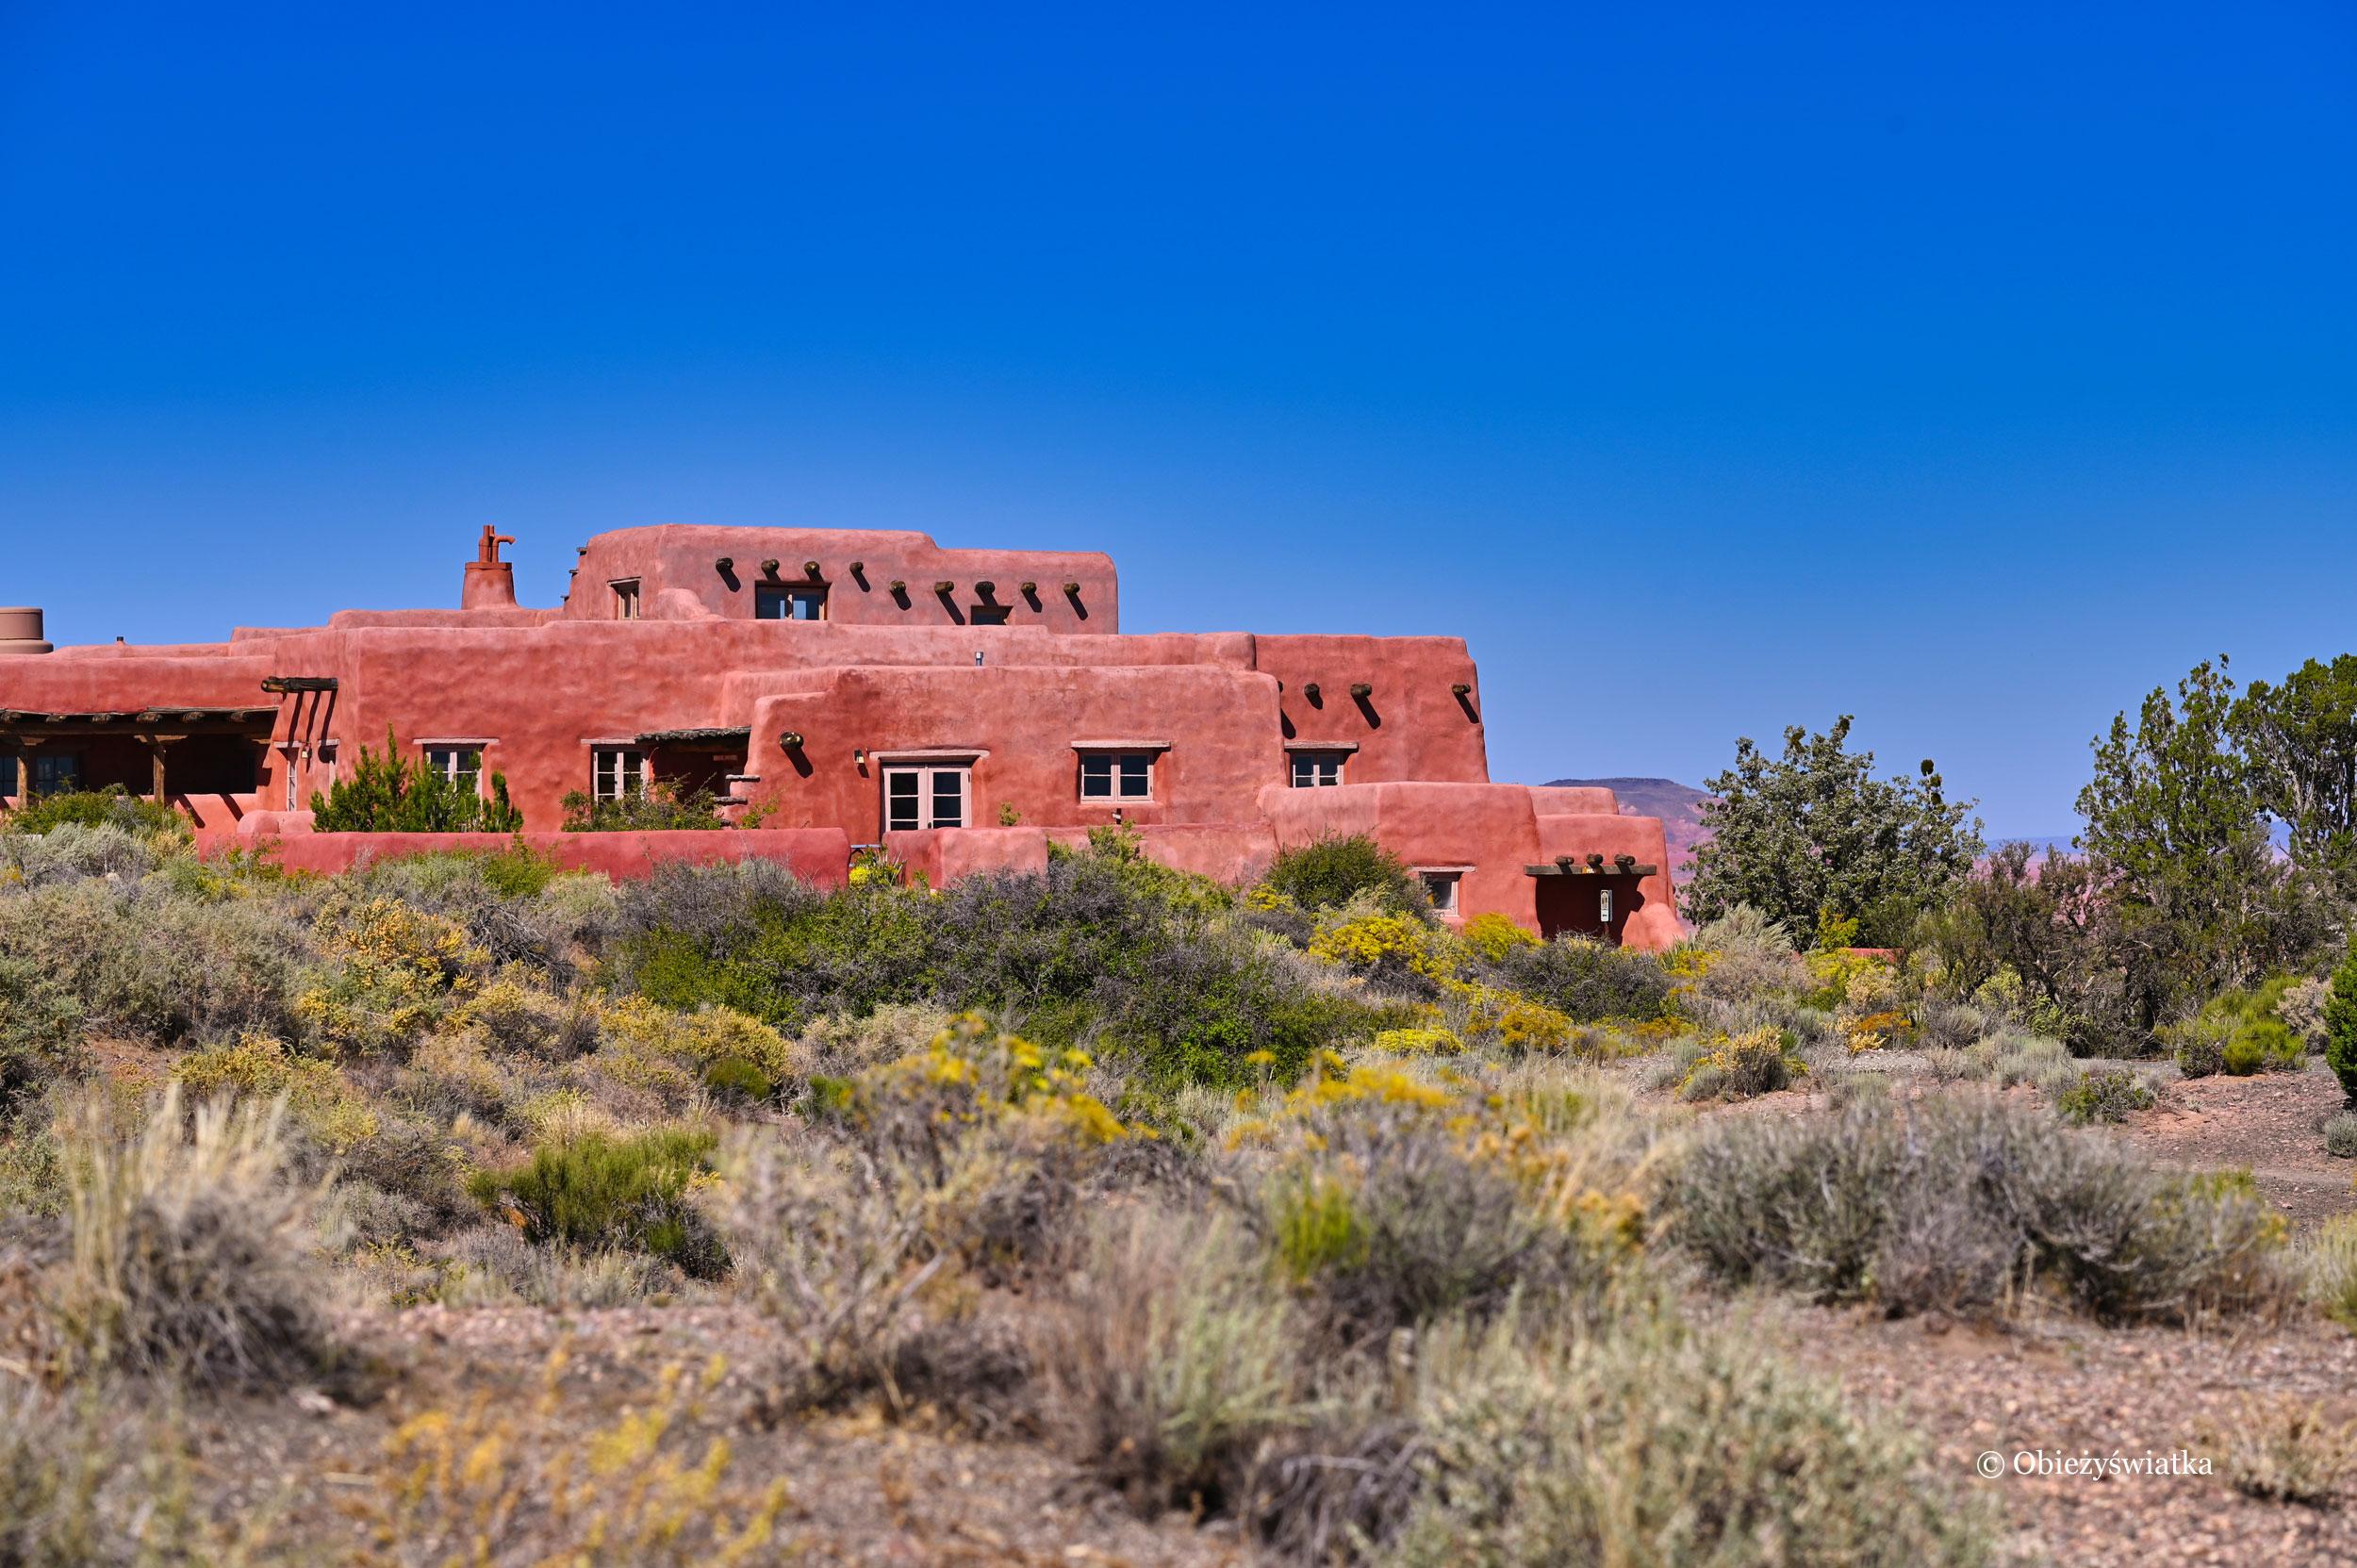 Painted Desert Inn w stylu Pueblo Revival architecture, Painted Desert, Arizona